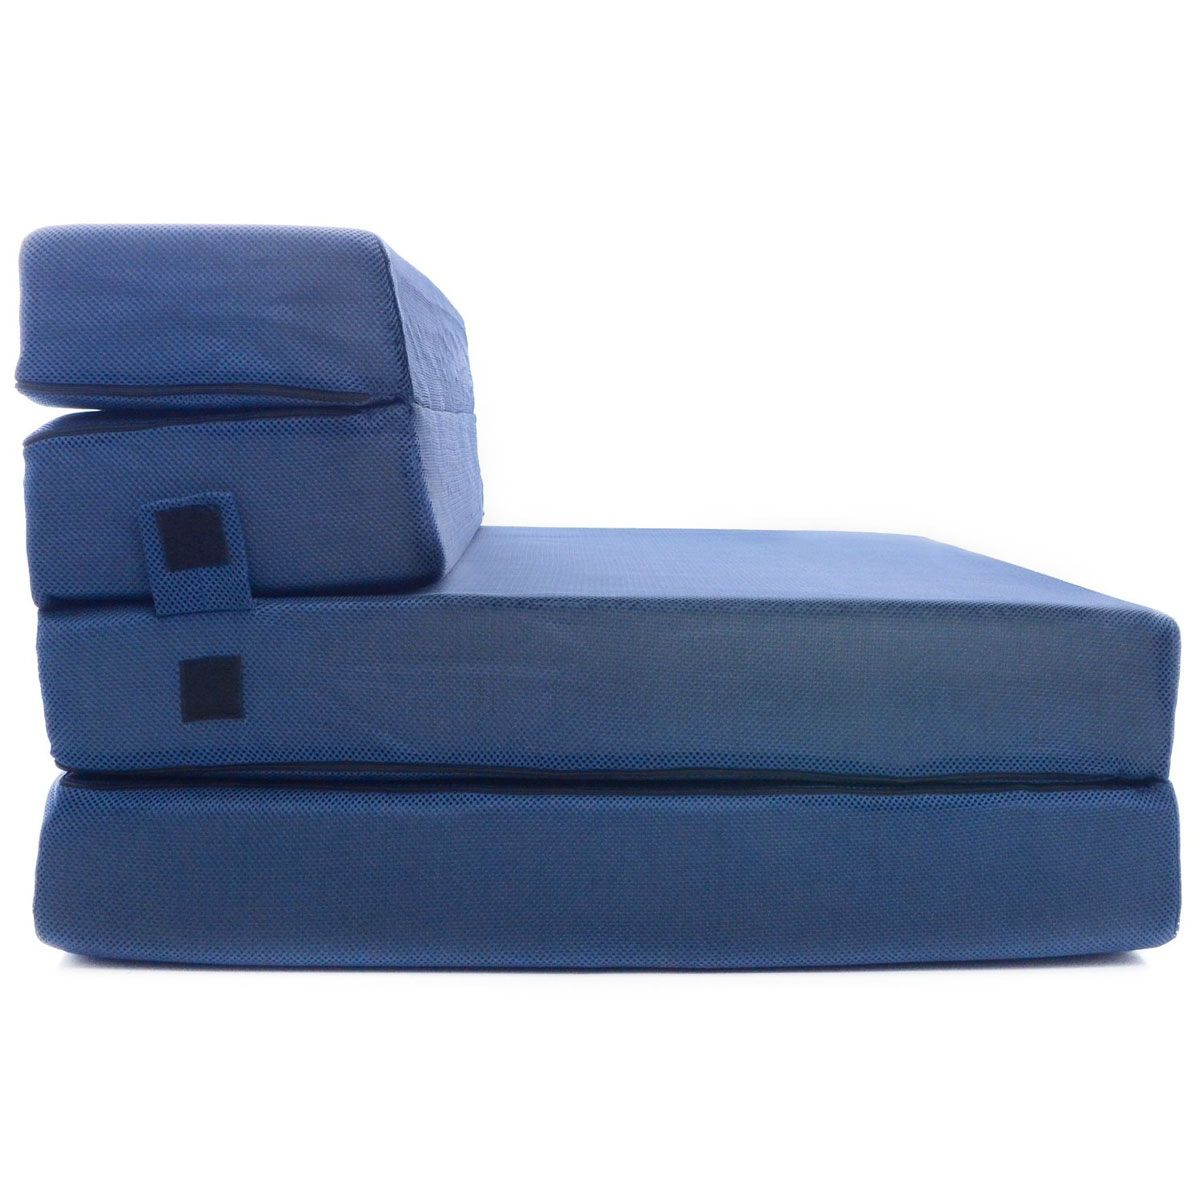 folding foam bed chair big fold up tri mattress and sofa loft beds